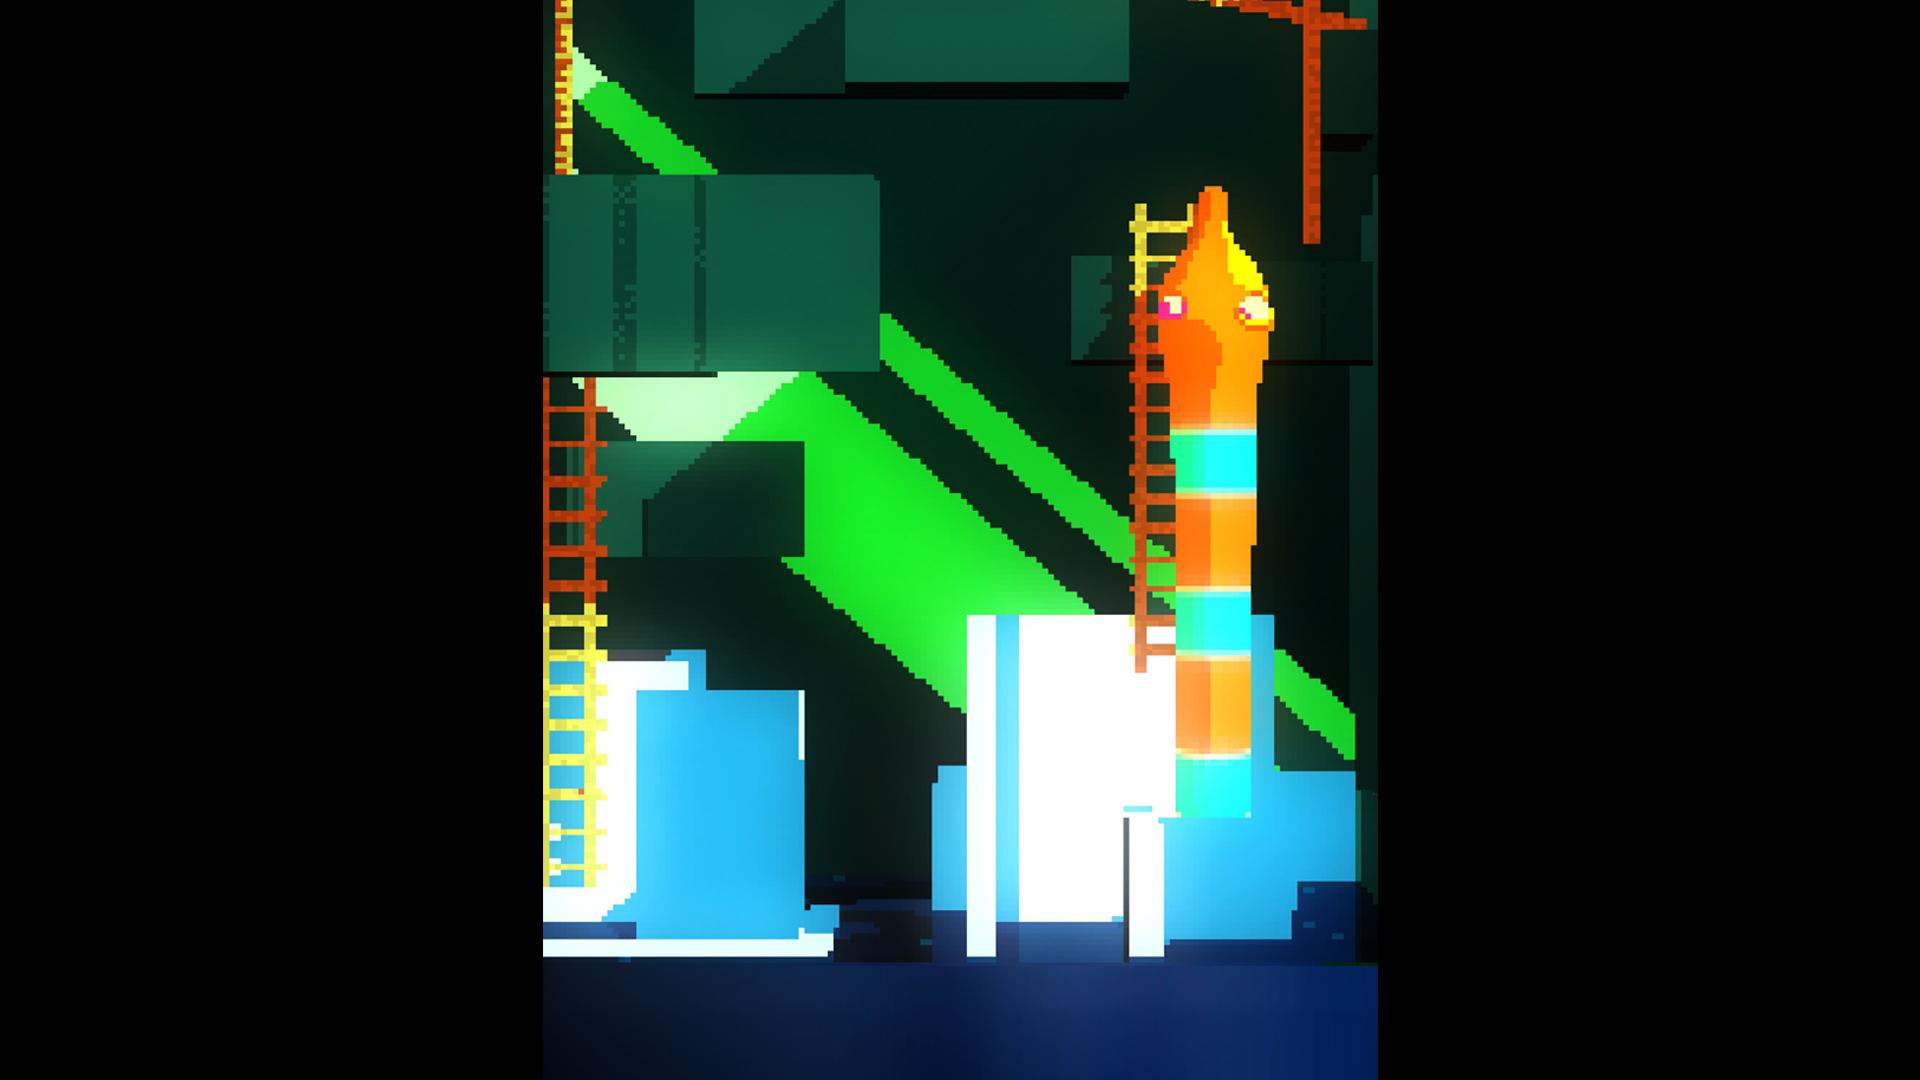 Vertical representation of the scene above.